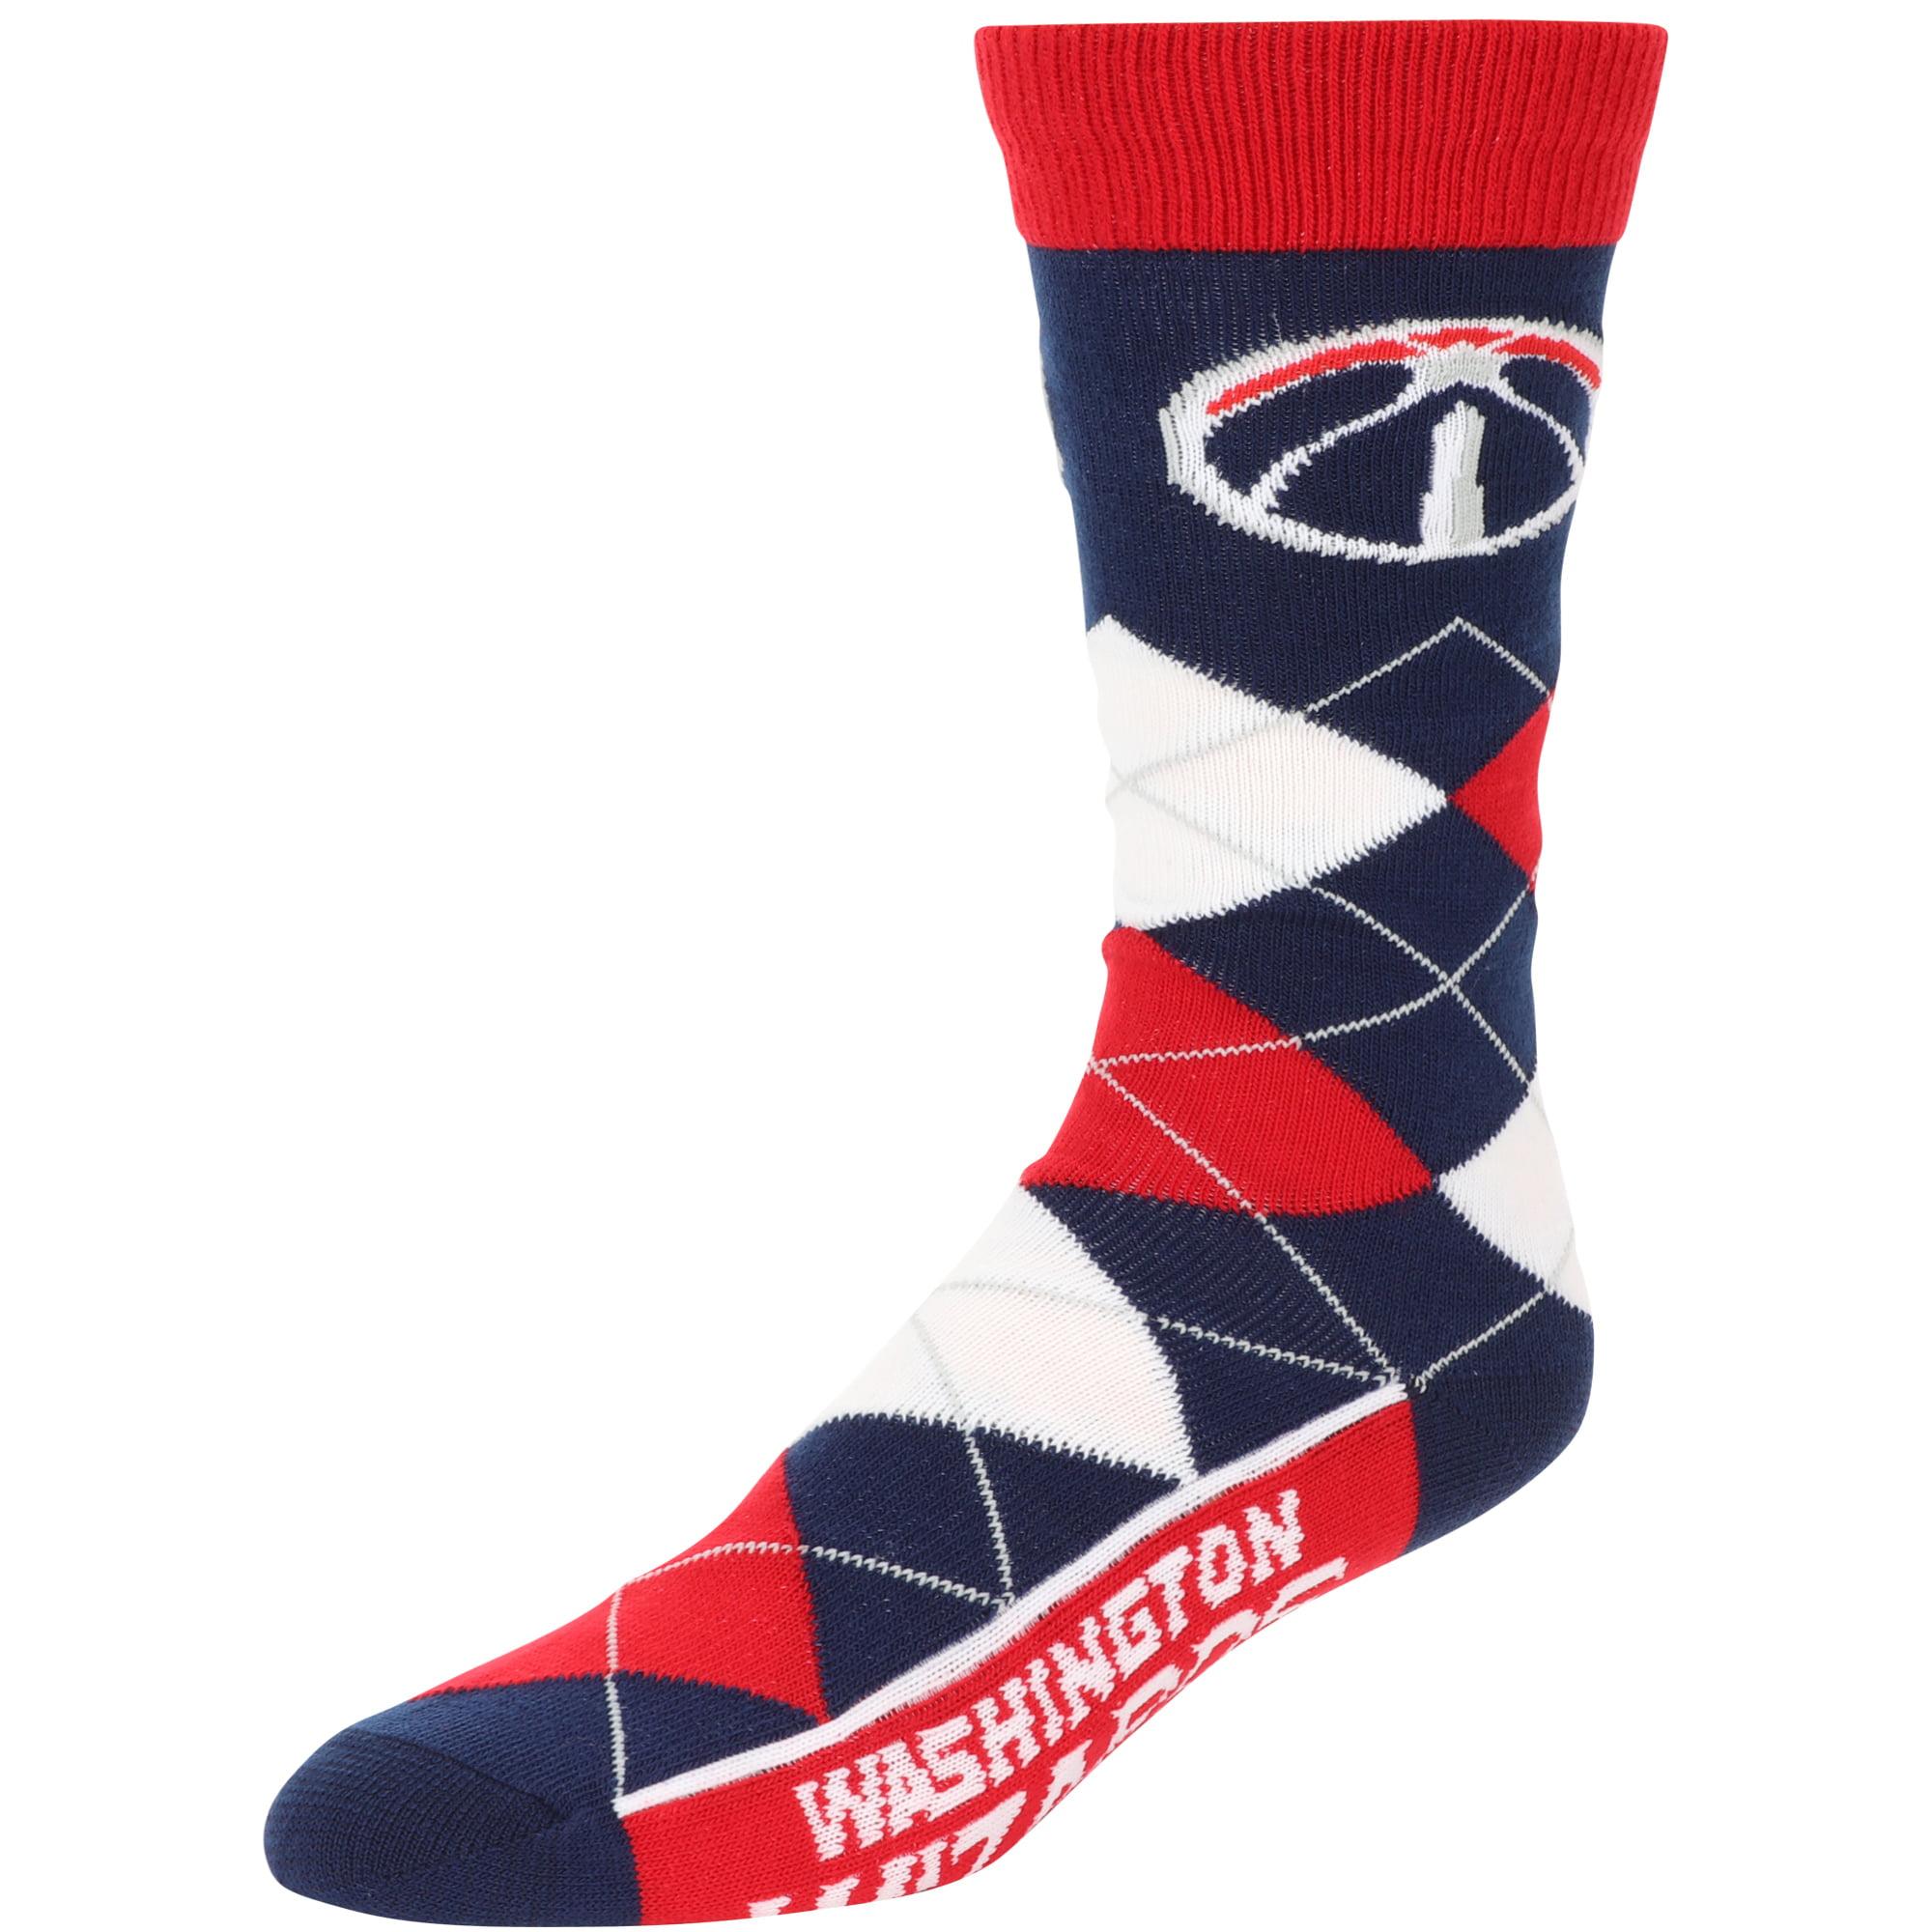 Washington Wizards For Bare Feet Team Argyle Crew Socks - No Size